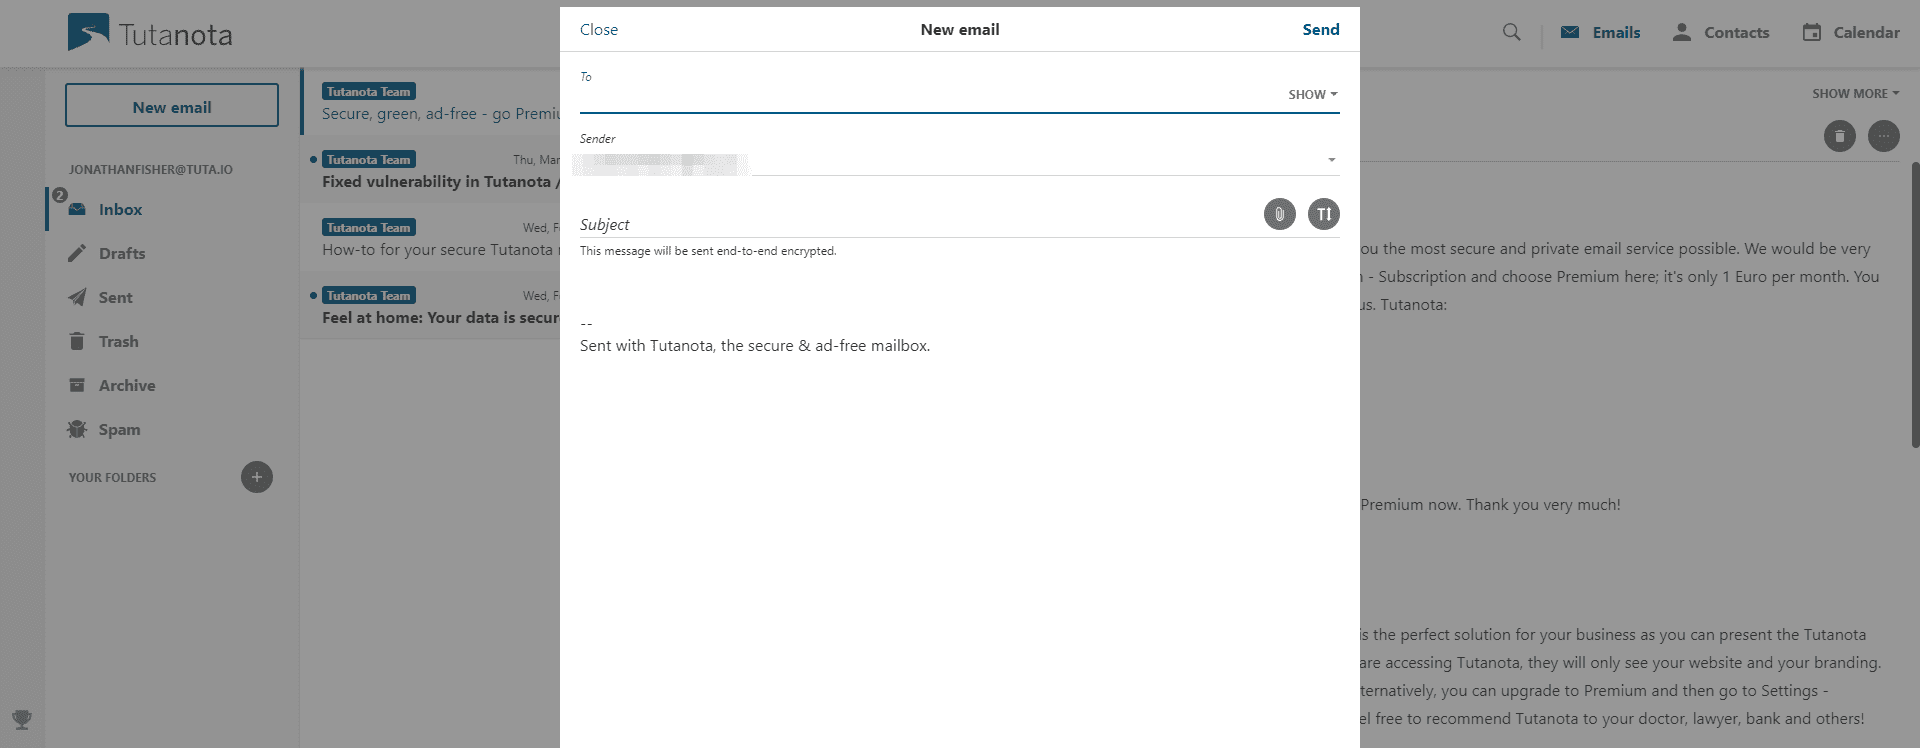 A Tutanota email inbox